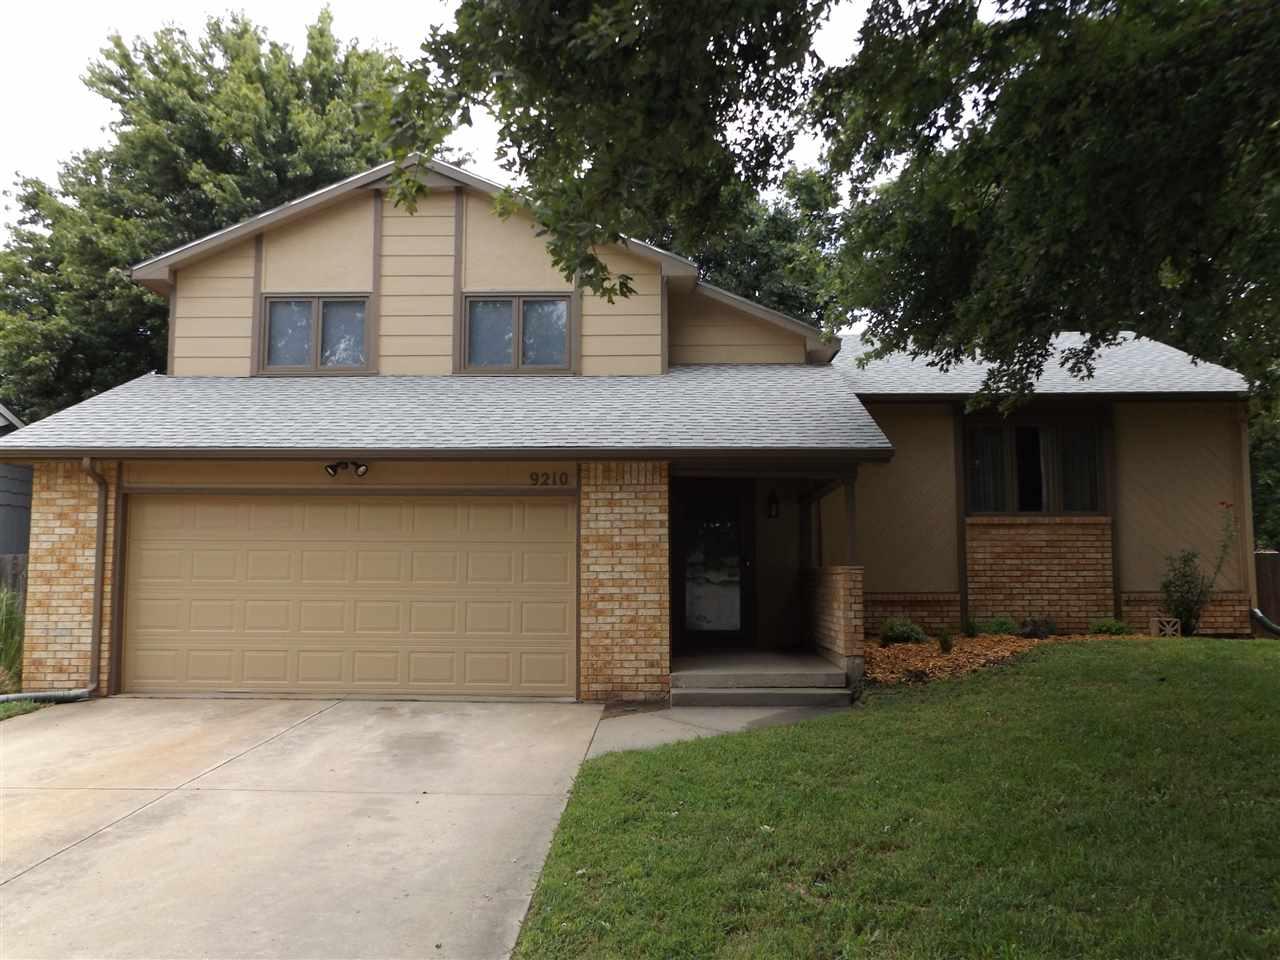 9210 W Westport, Wichita, KS 67212